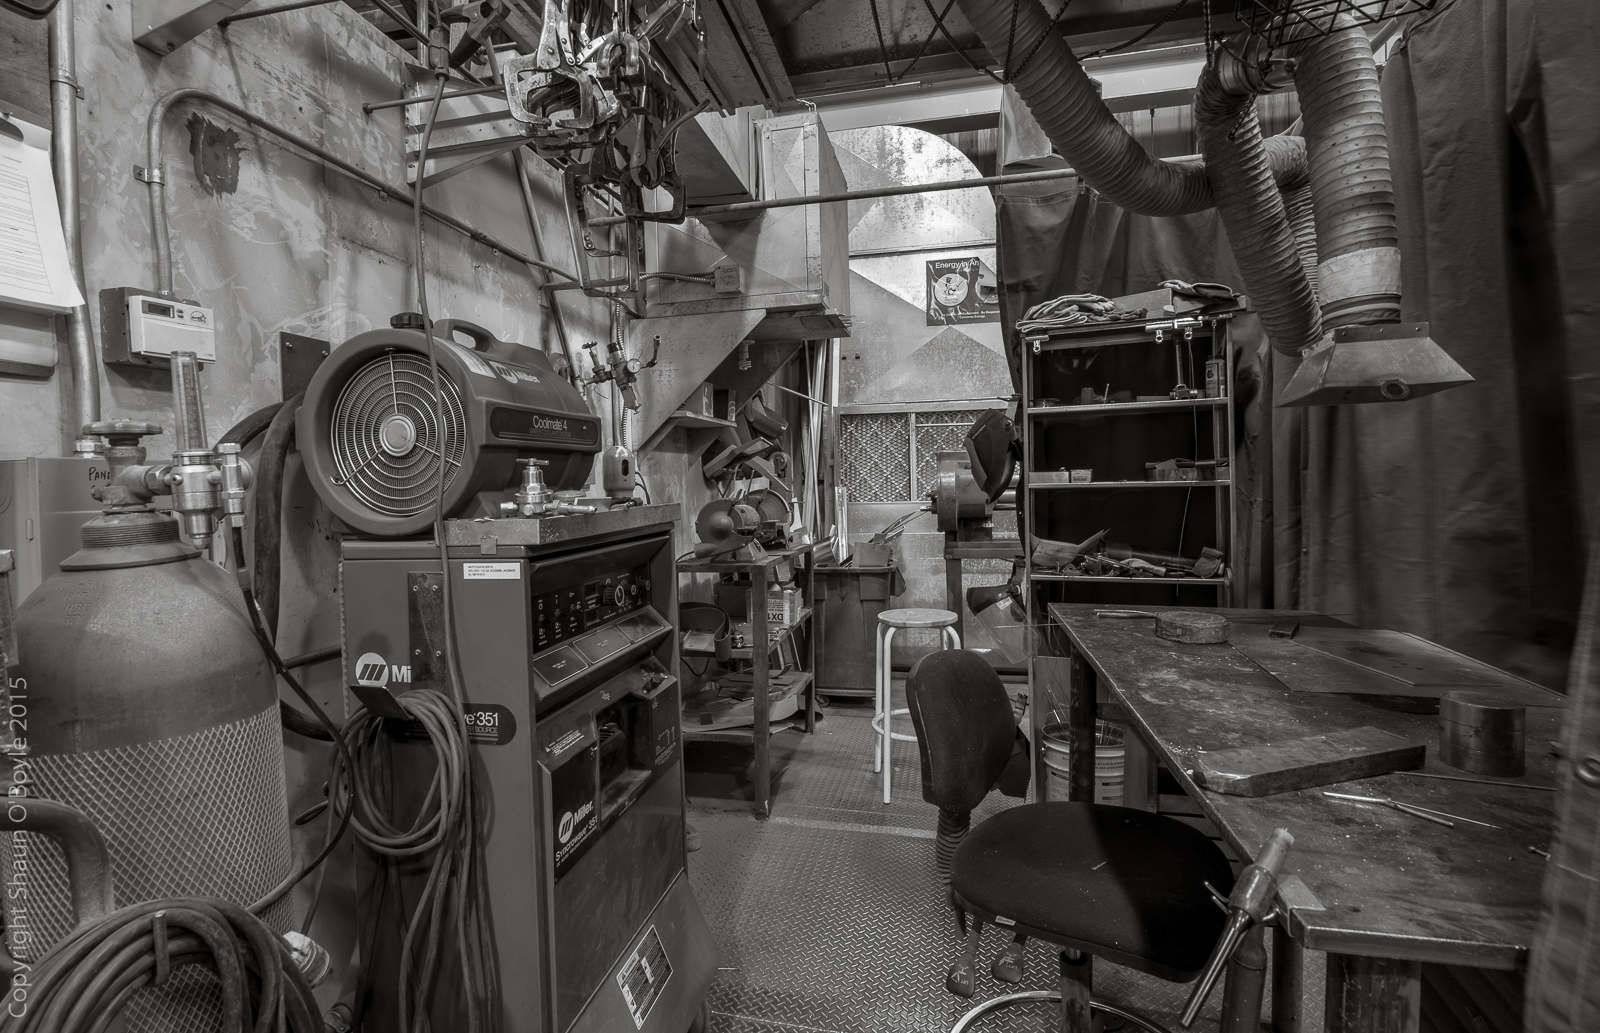 FEMC Trade Shop welding booth